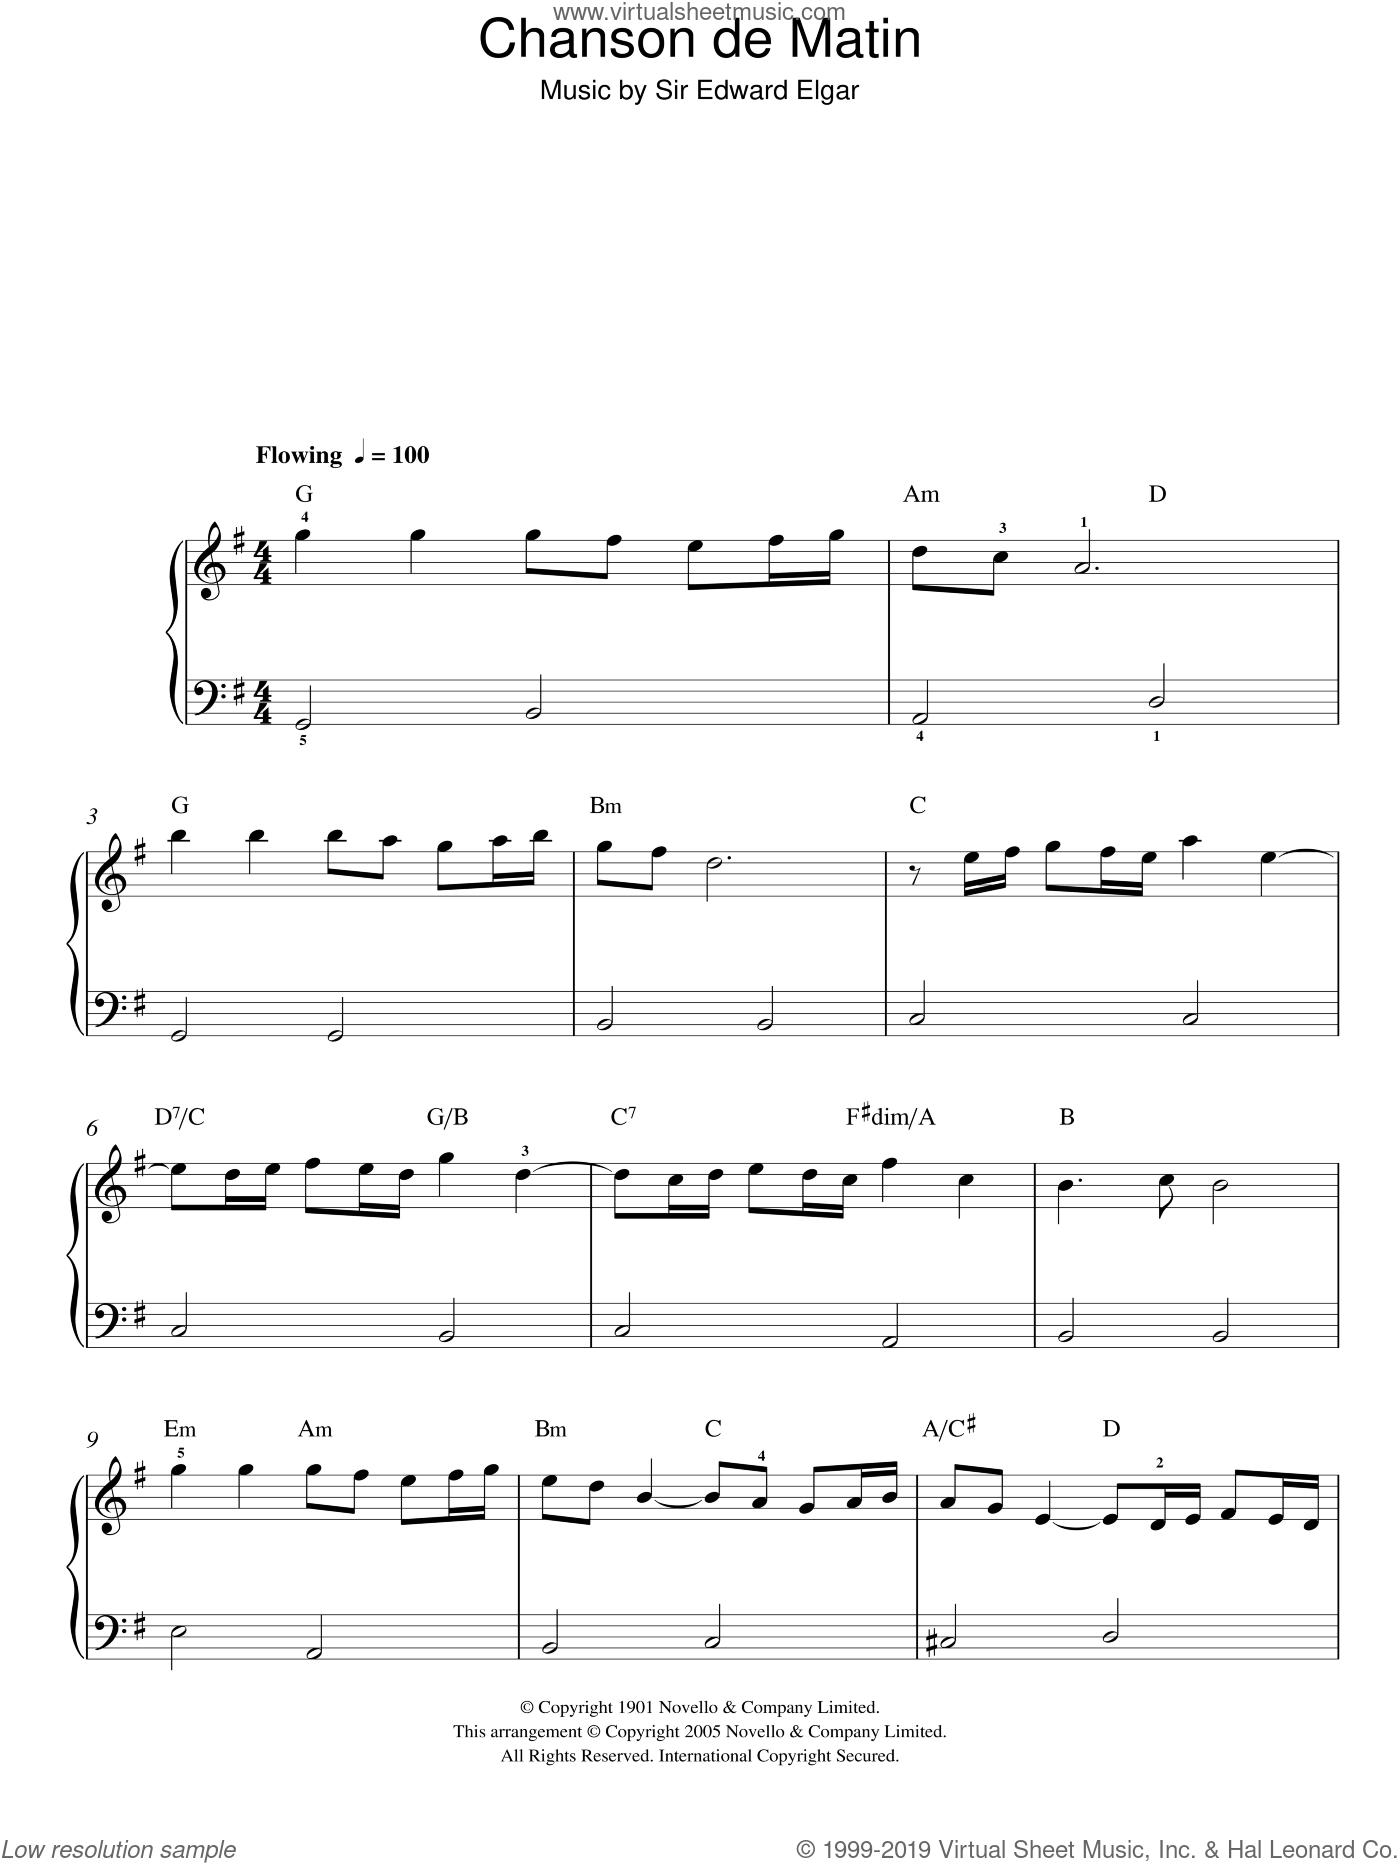 Chanson De Matin Op. 15, No. 2 sheet music for piano solo by Edward Elgar, classical score, easy skill level